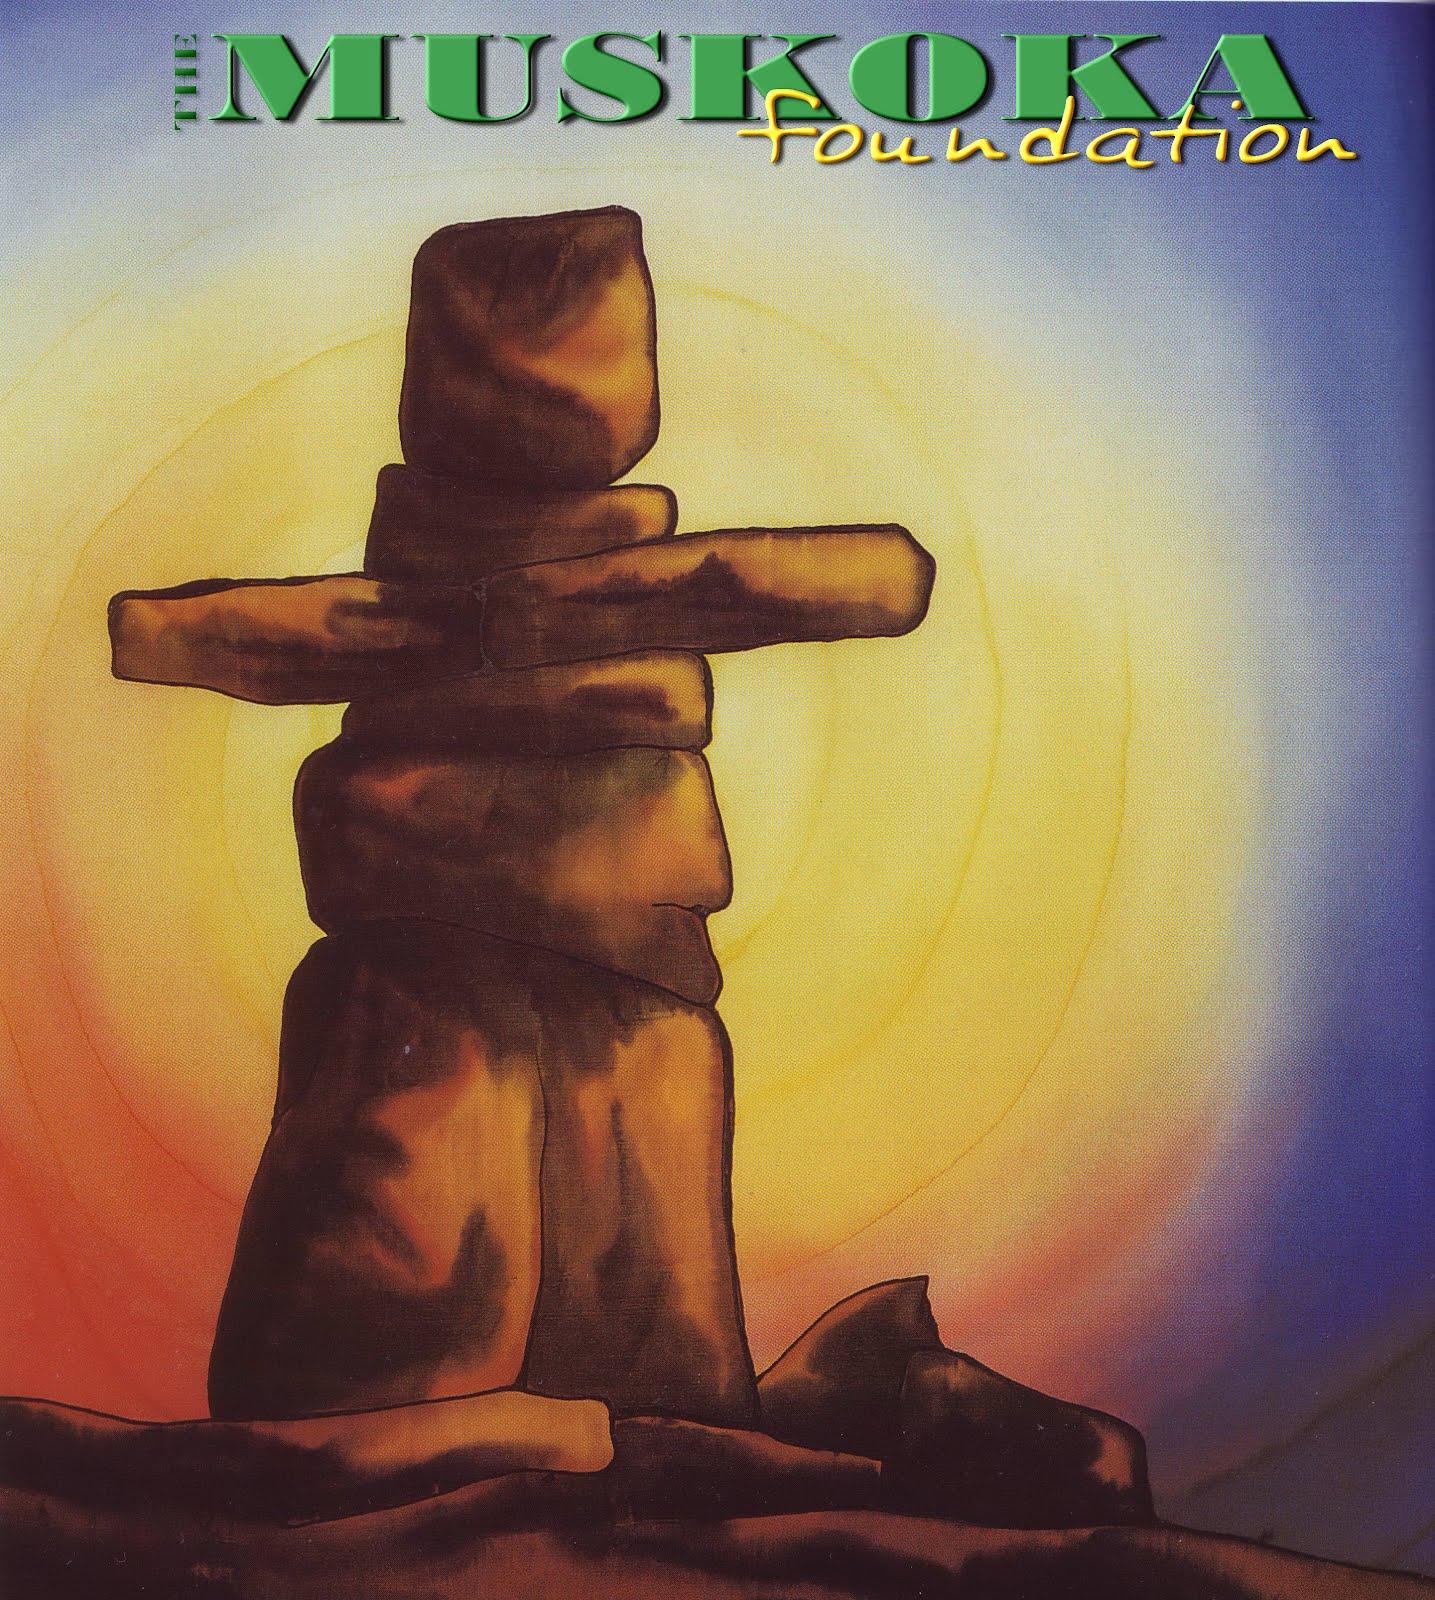 MuskokaFoundation-logo-HI REZ.jpg